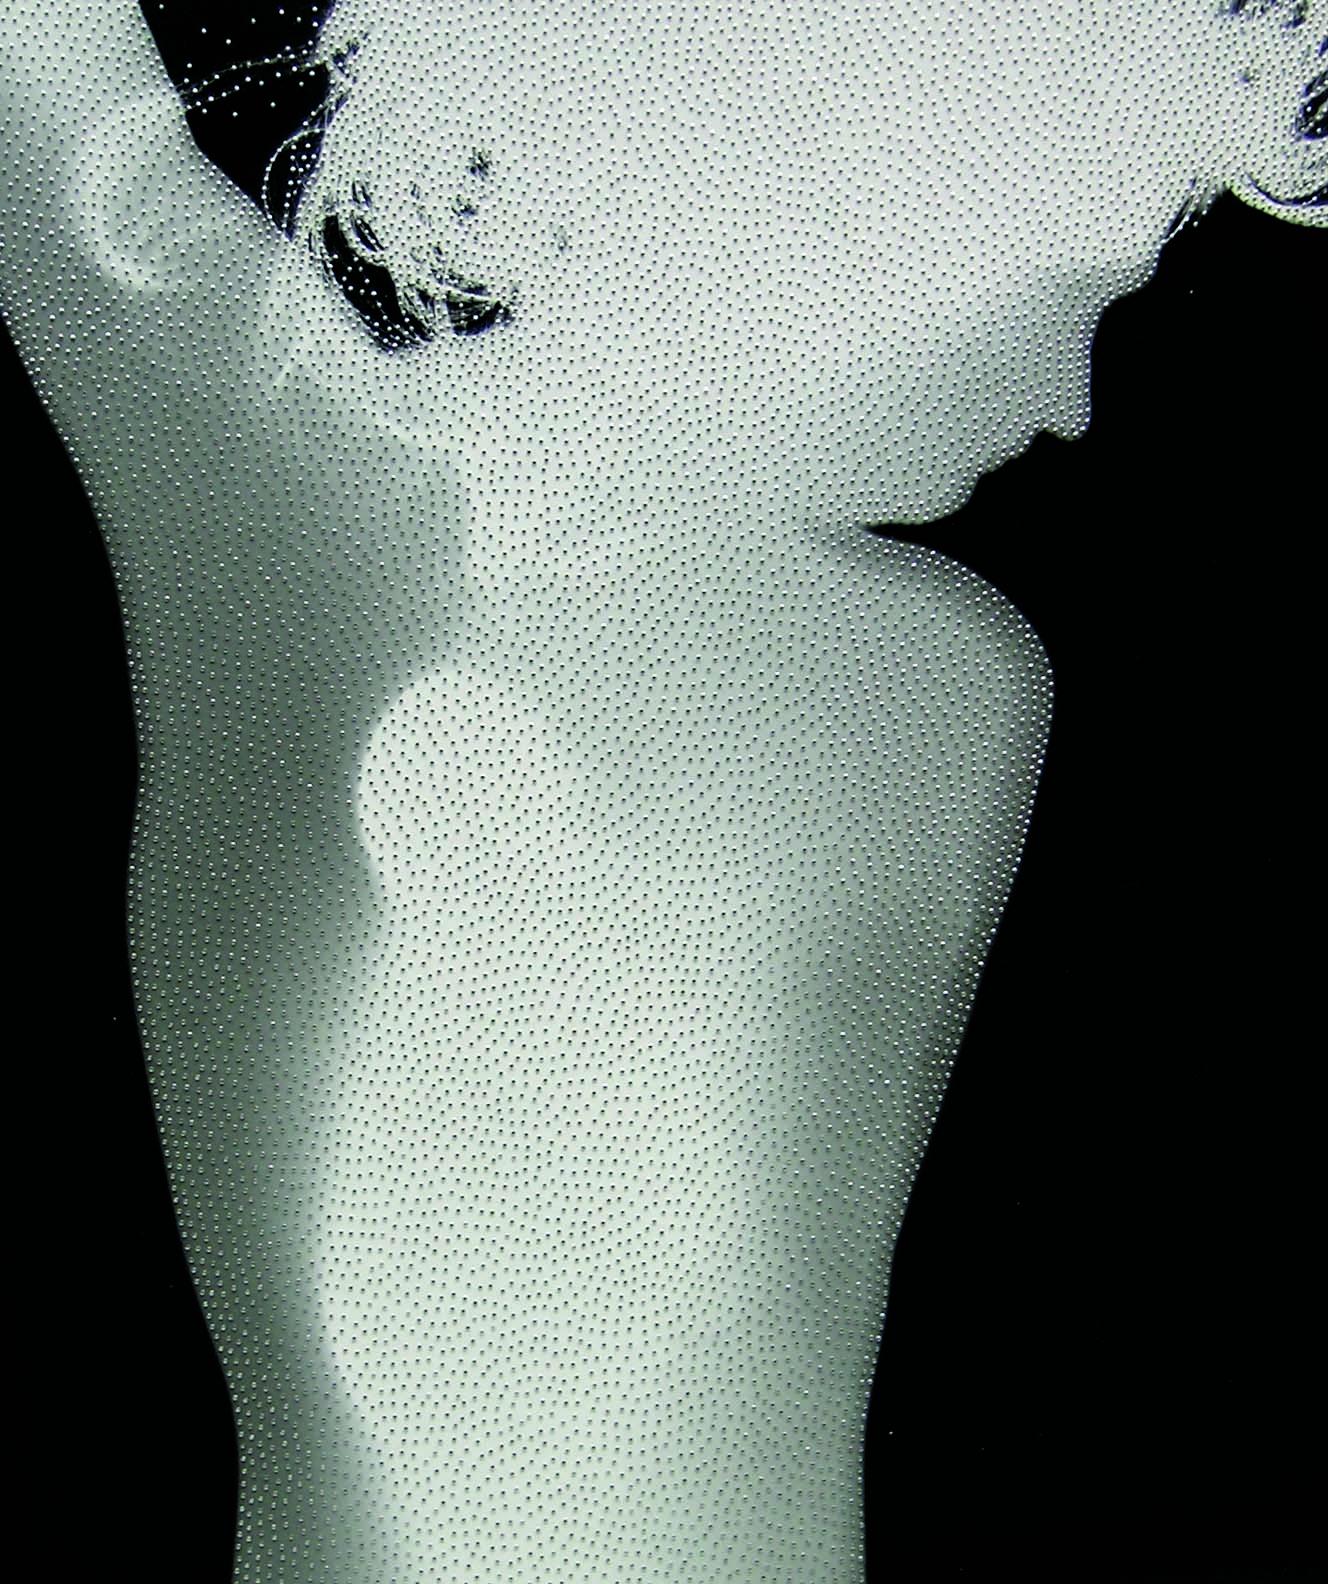 Satori n. 17 (2014 fotogramma e spilli in acciaio inox, cm 50 x 60)